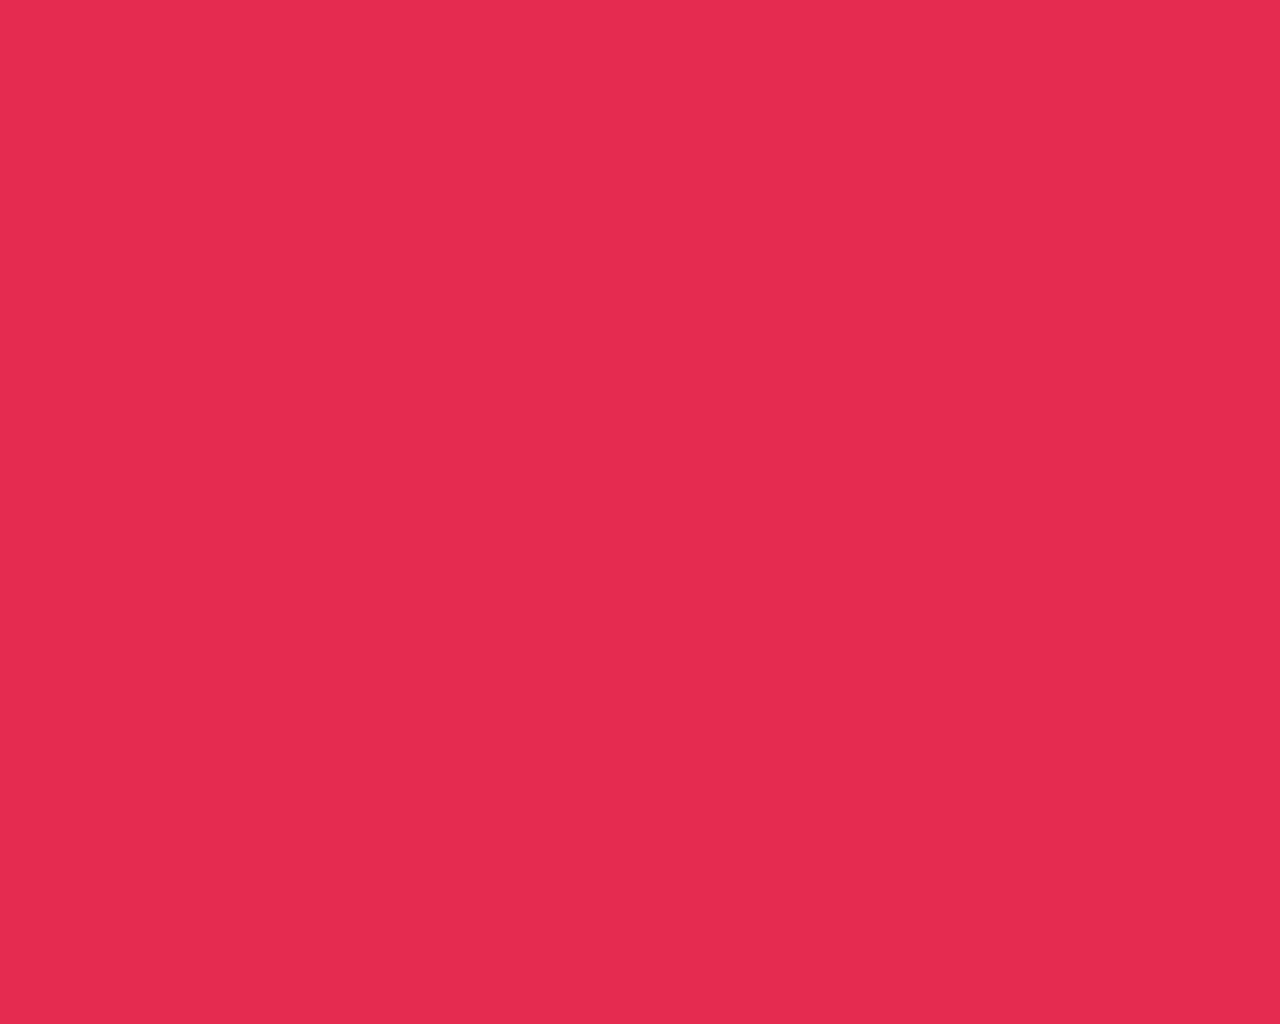 1280x1024 Amaranth Solid Color Background